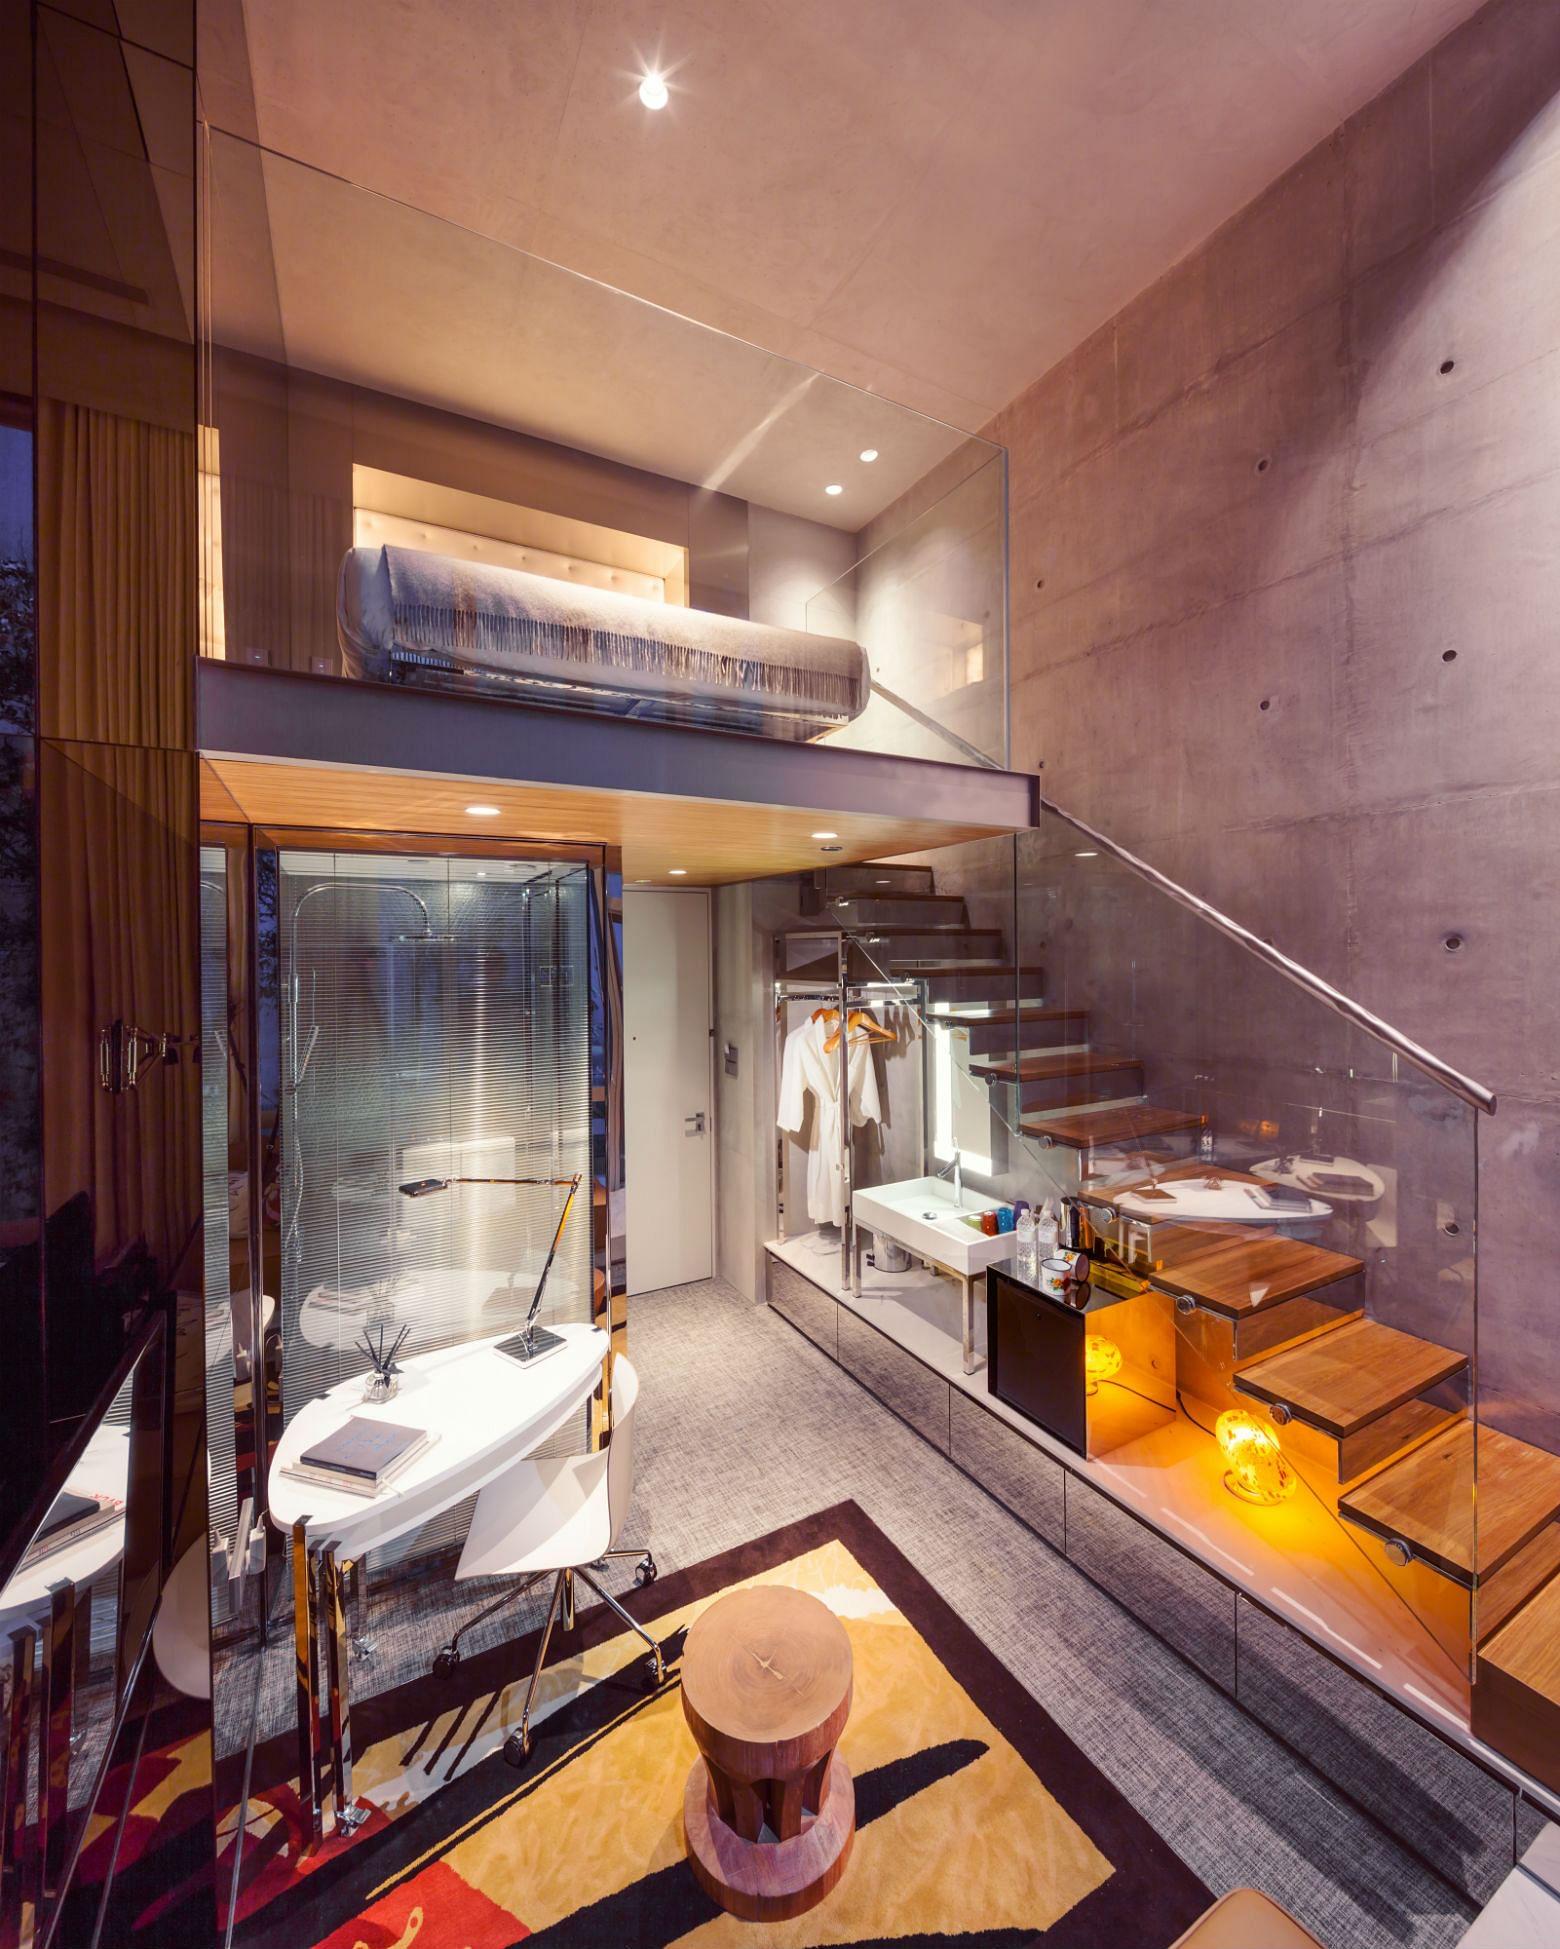 Fashion Design Interior Design Singapore: Coming Soon: M Social Singapore, A Gorgeous Philippe